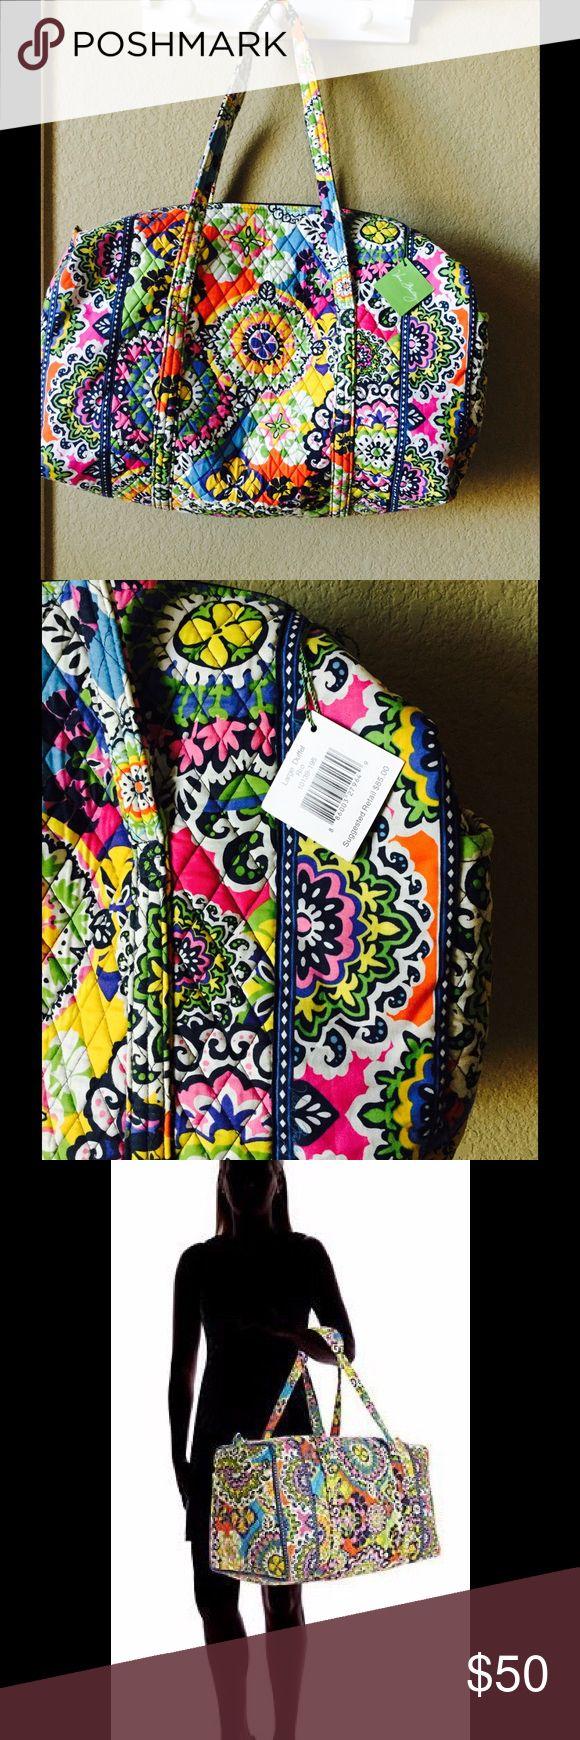 Selling this Vera Bradley Large Duffel Bag ️uthentic on Poshmark! My username is: ravensmama. #shopmycloset #poshmark #fashion #shopping #style #forsale #Vera Bradley #Handbags